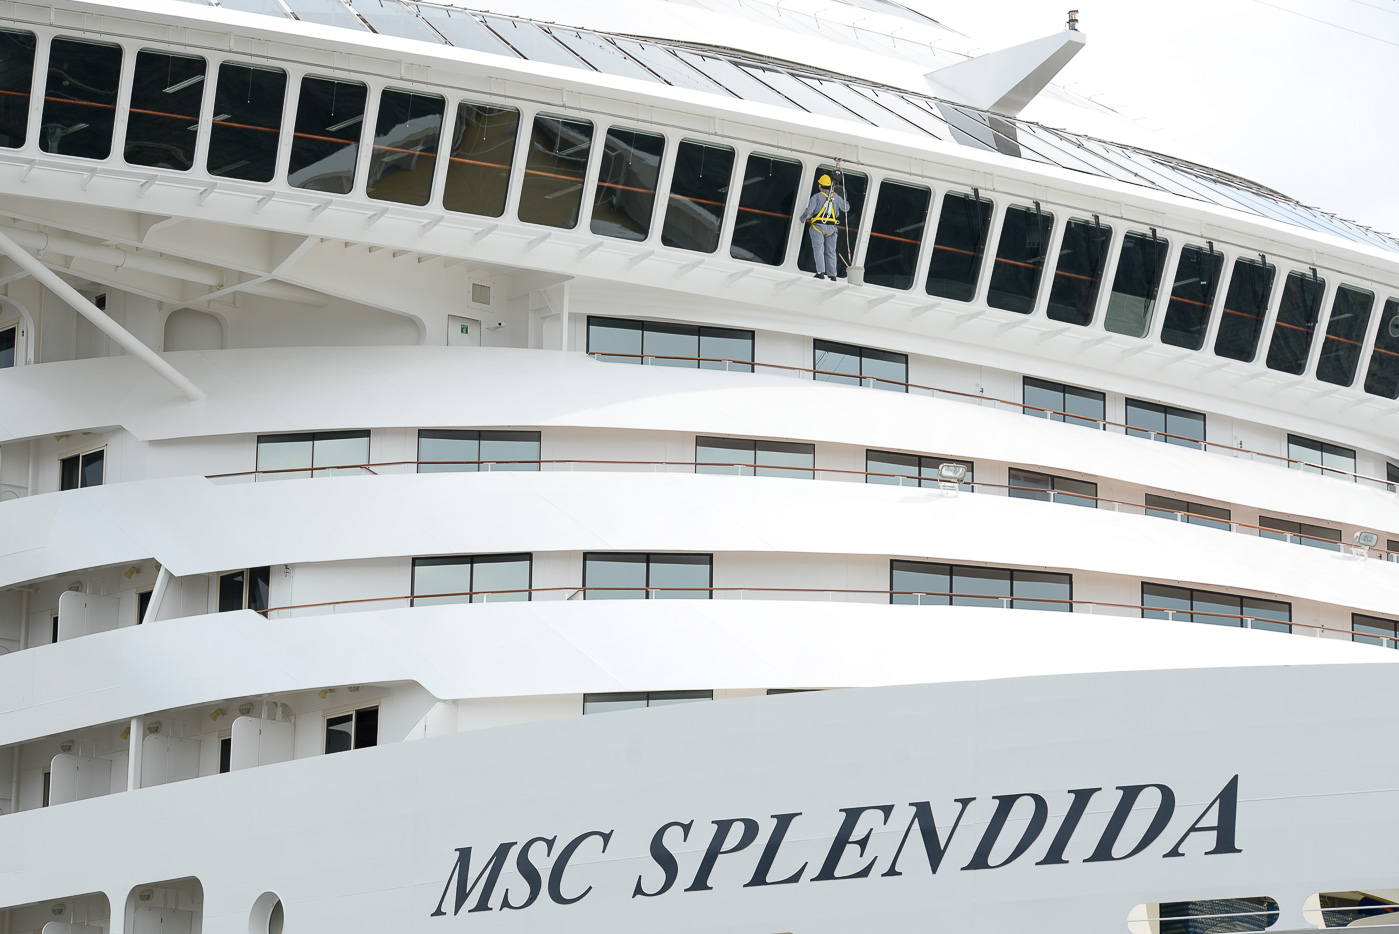 Foto 150913033 Kreuzfahrtschiff MSC Splandida